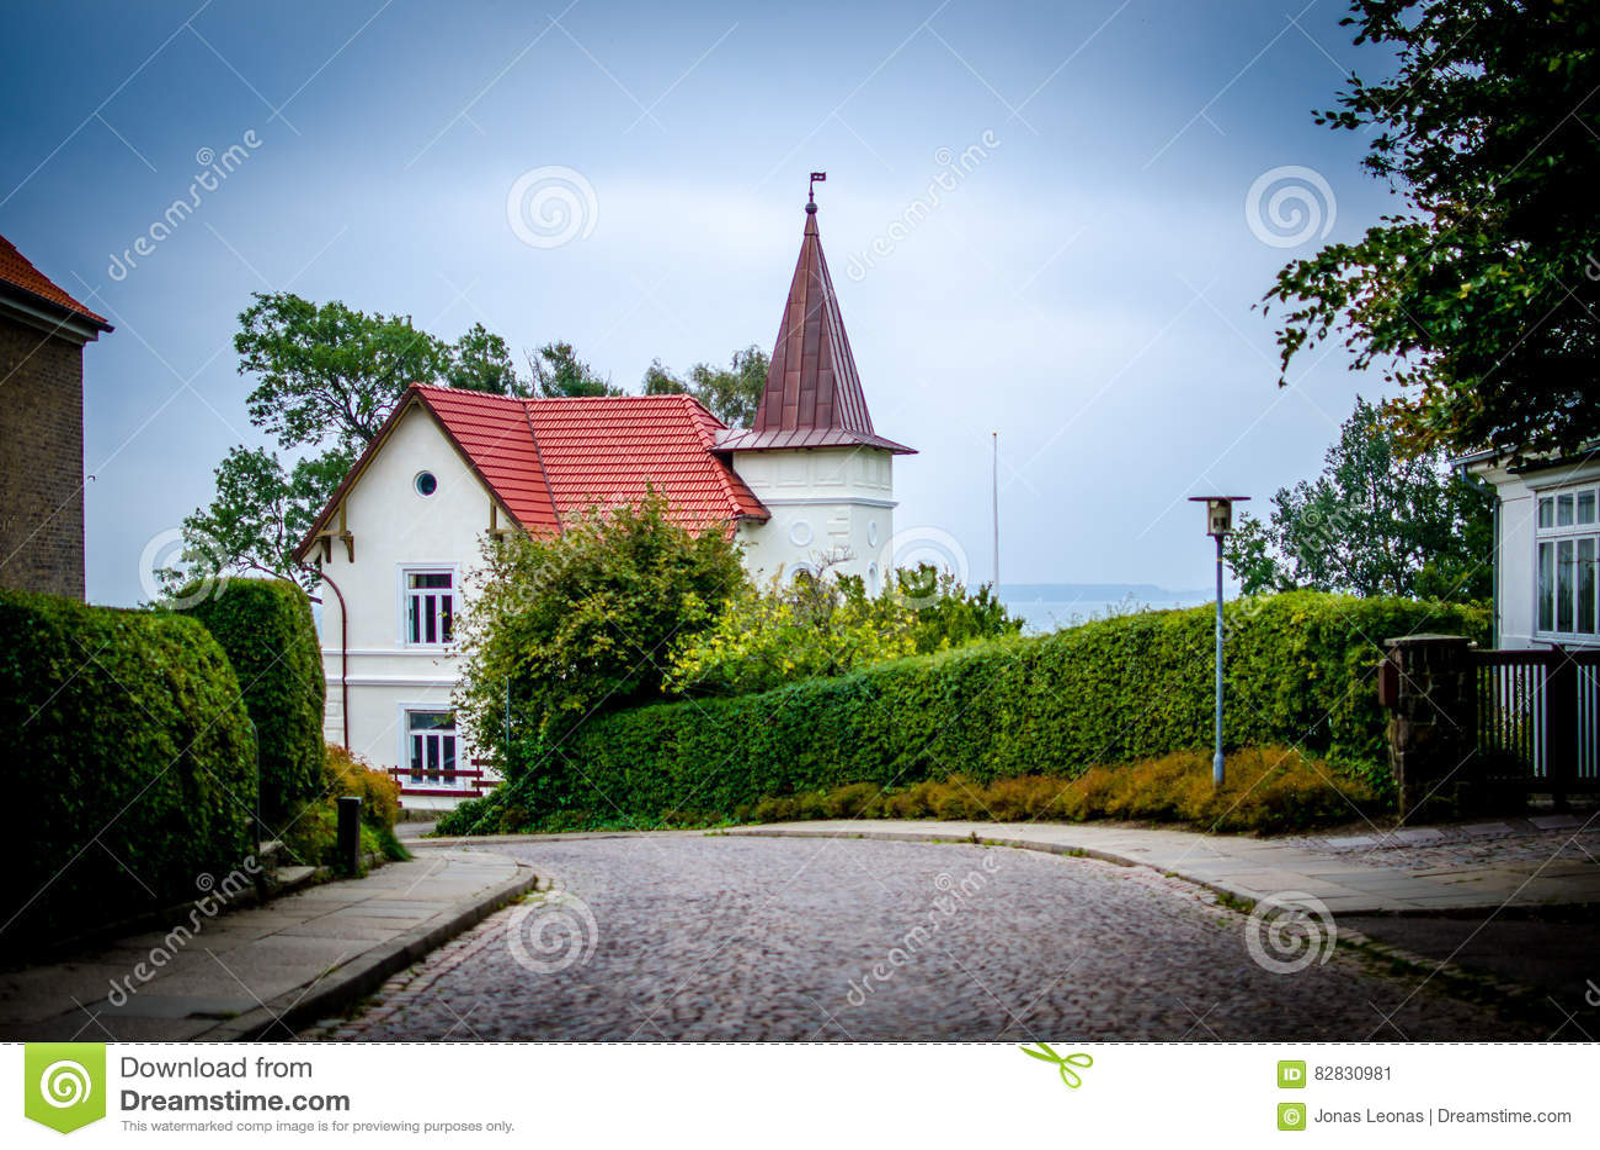 Skandinavisches haus am see  Skandinavisches Haus Am See | loopele.com